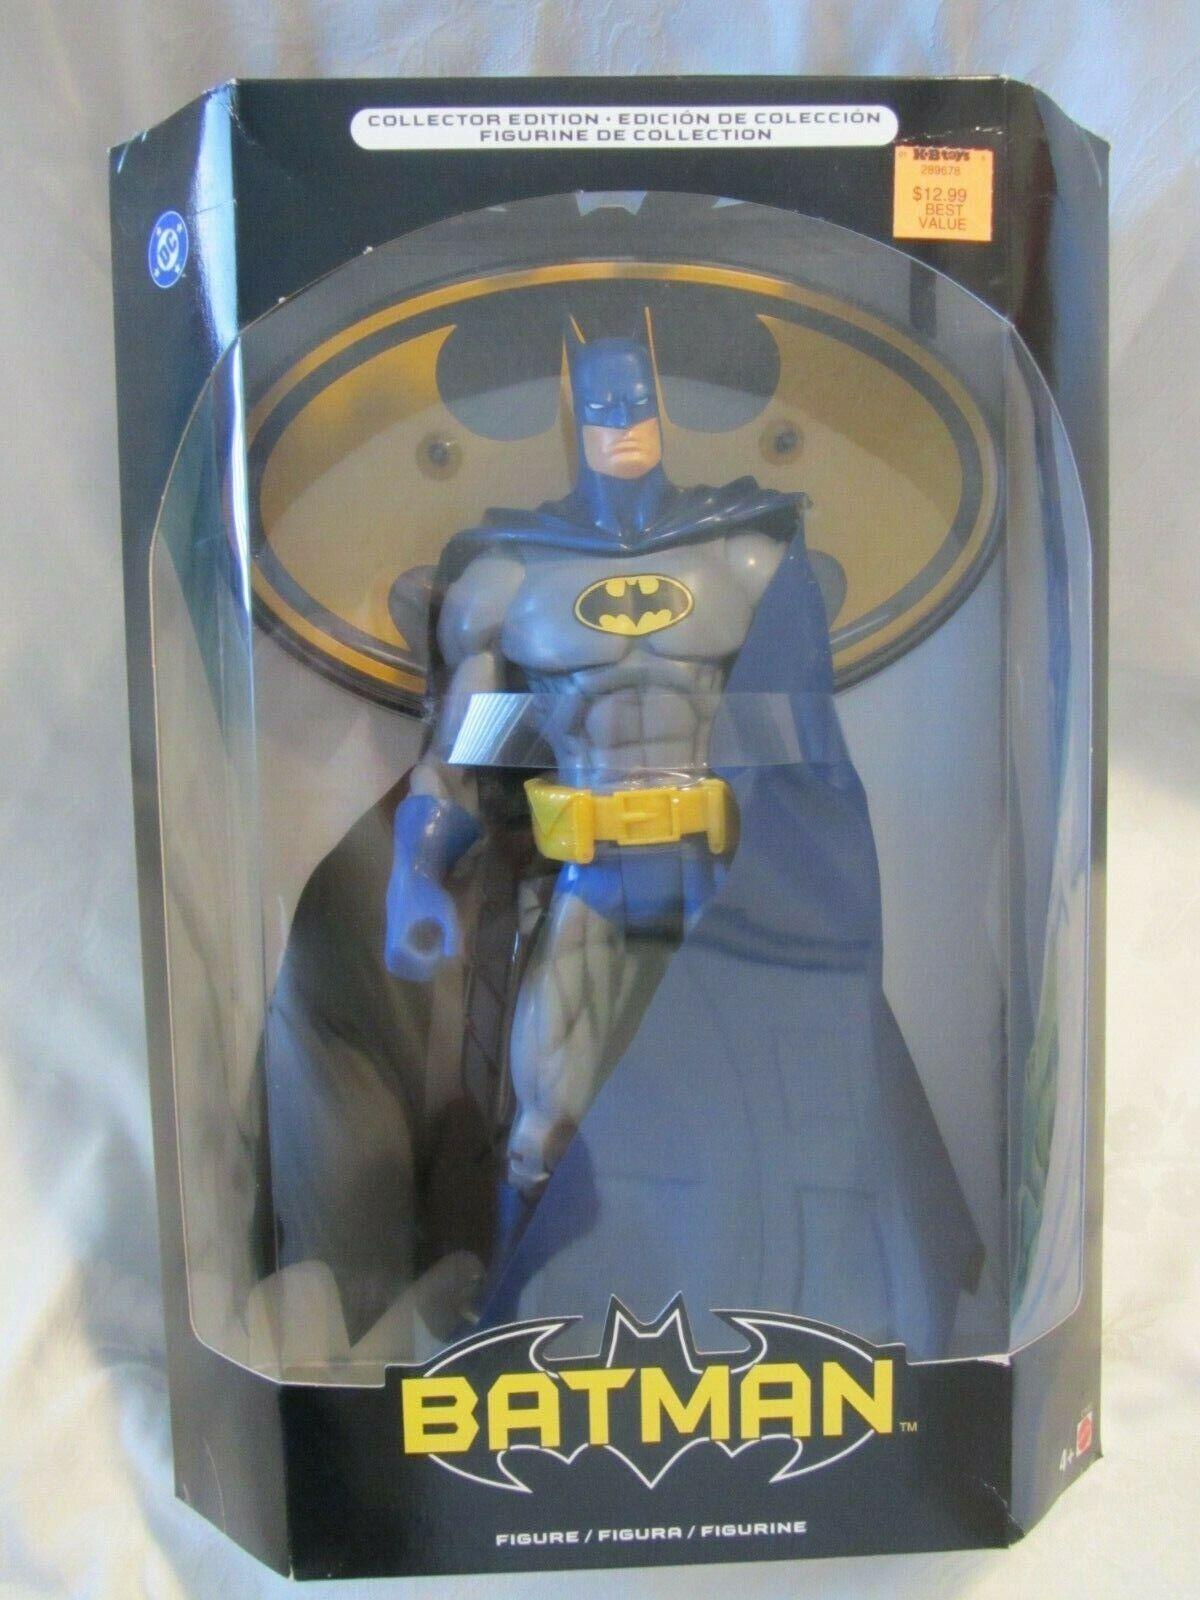 2004 MATTEL DC COMICS 12 IN BATMAN FIGURE COLLECTOR EDITION NEW IN SEALED BOX